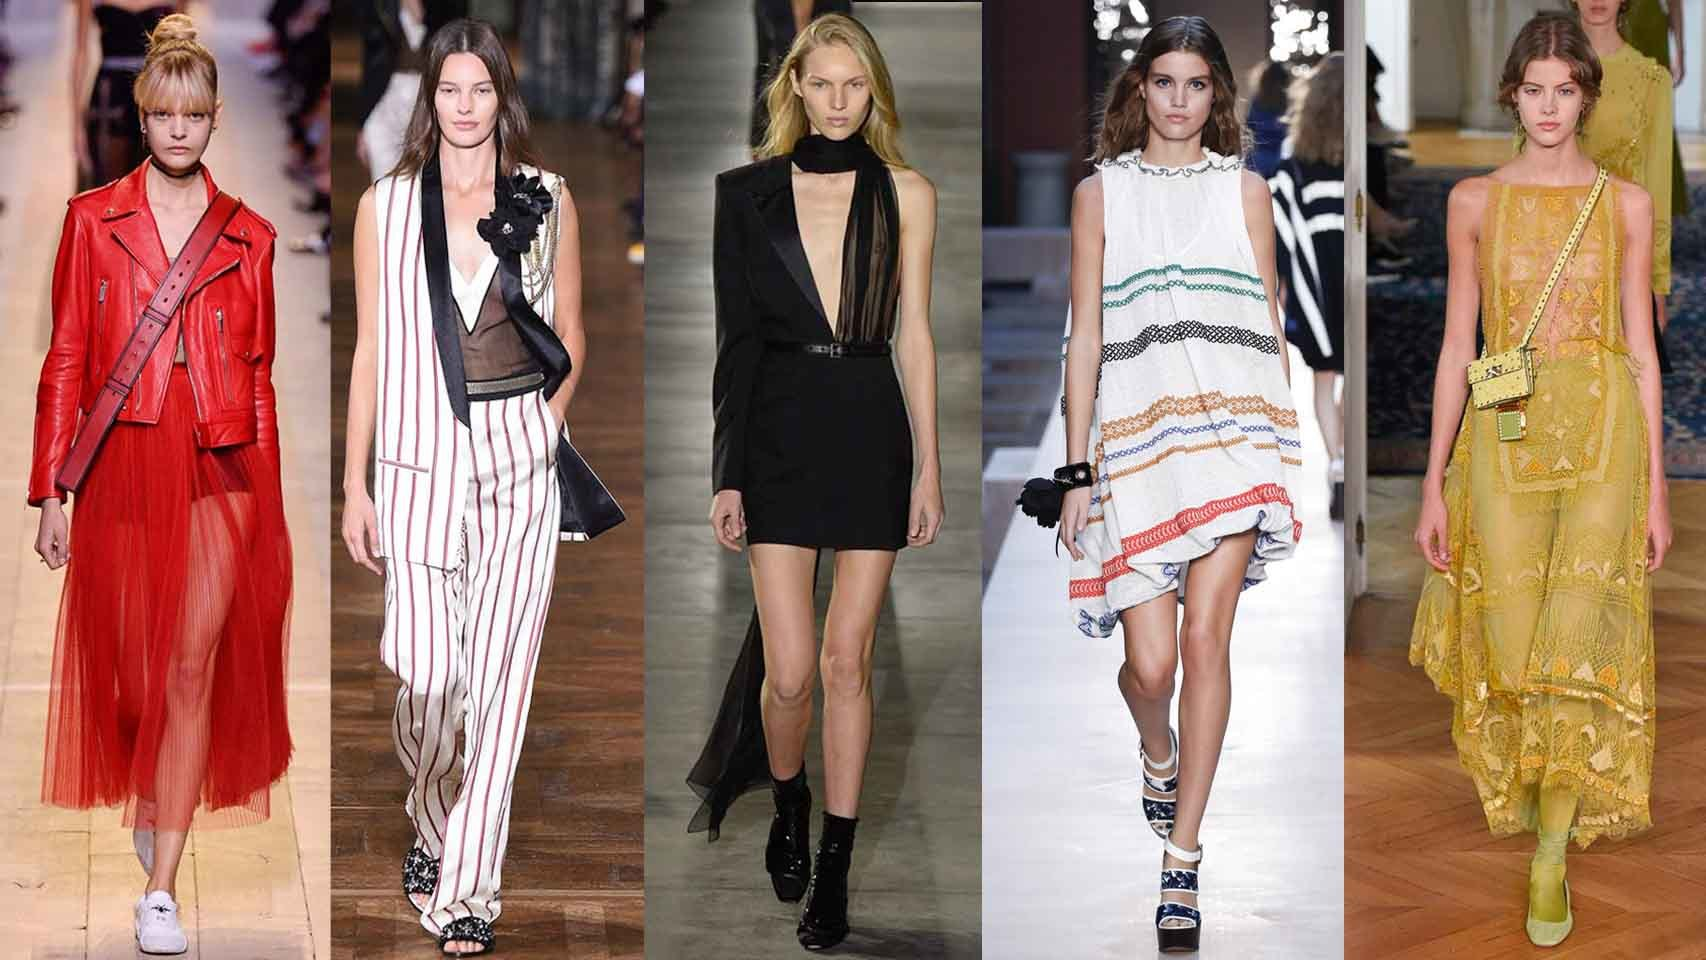 De izq. a dcha. diseños de Dior, Lanvin, Saint Laurent, Sonia Rykiel y Valentino.